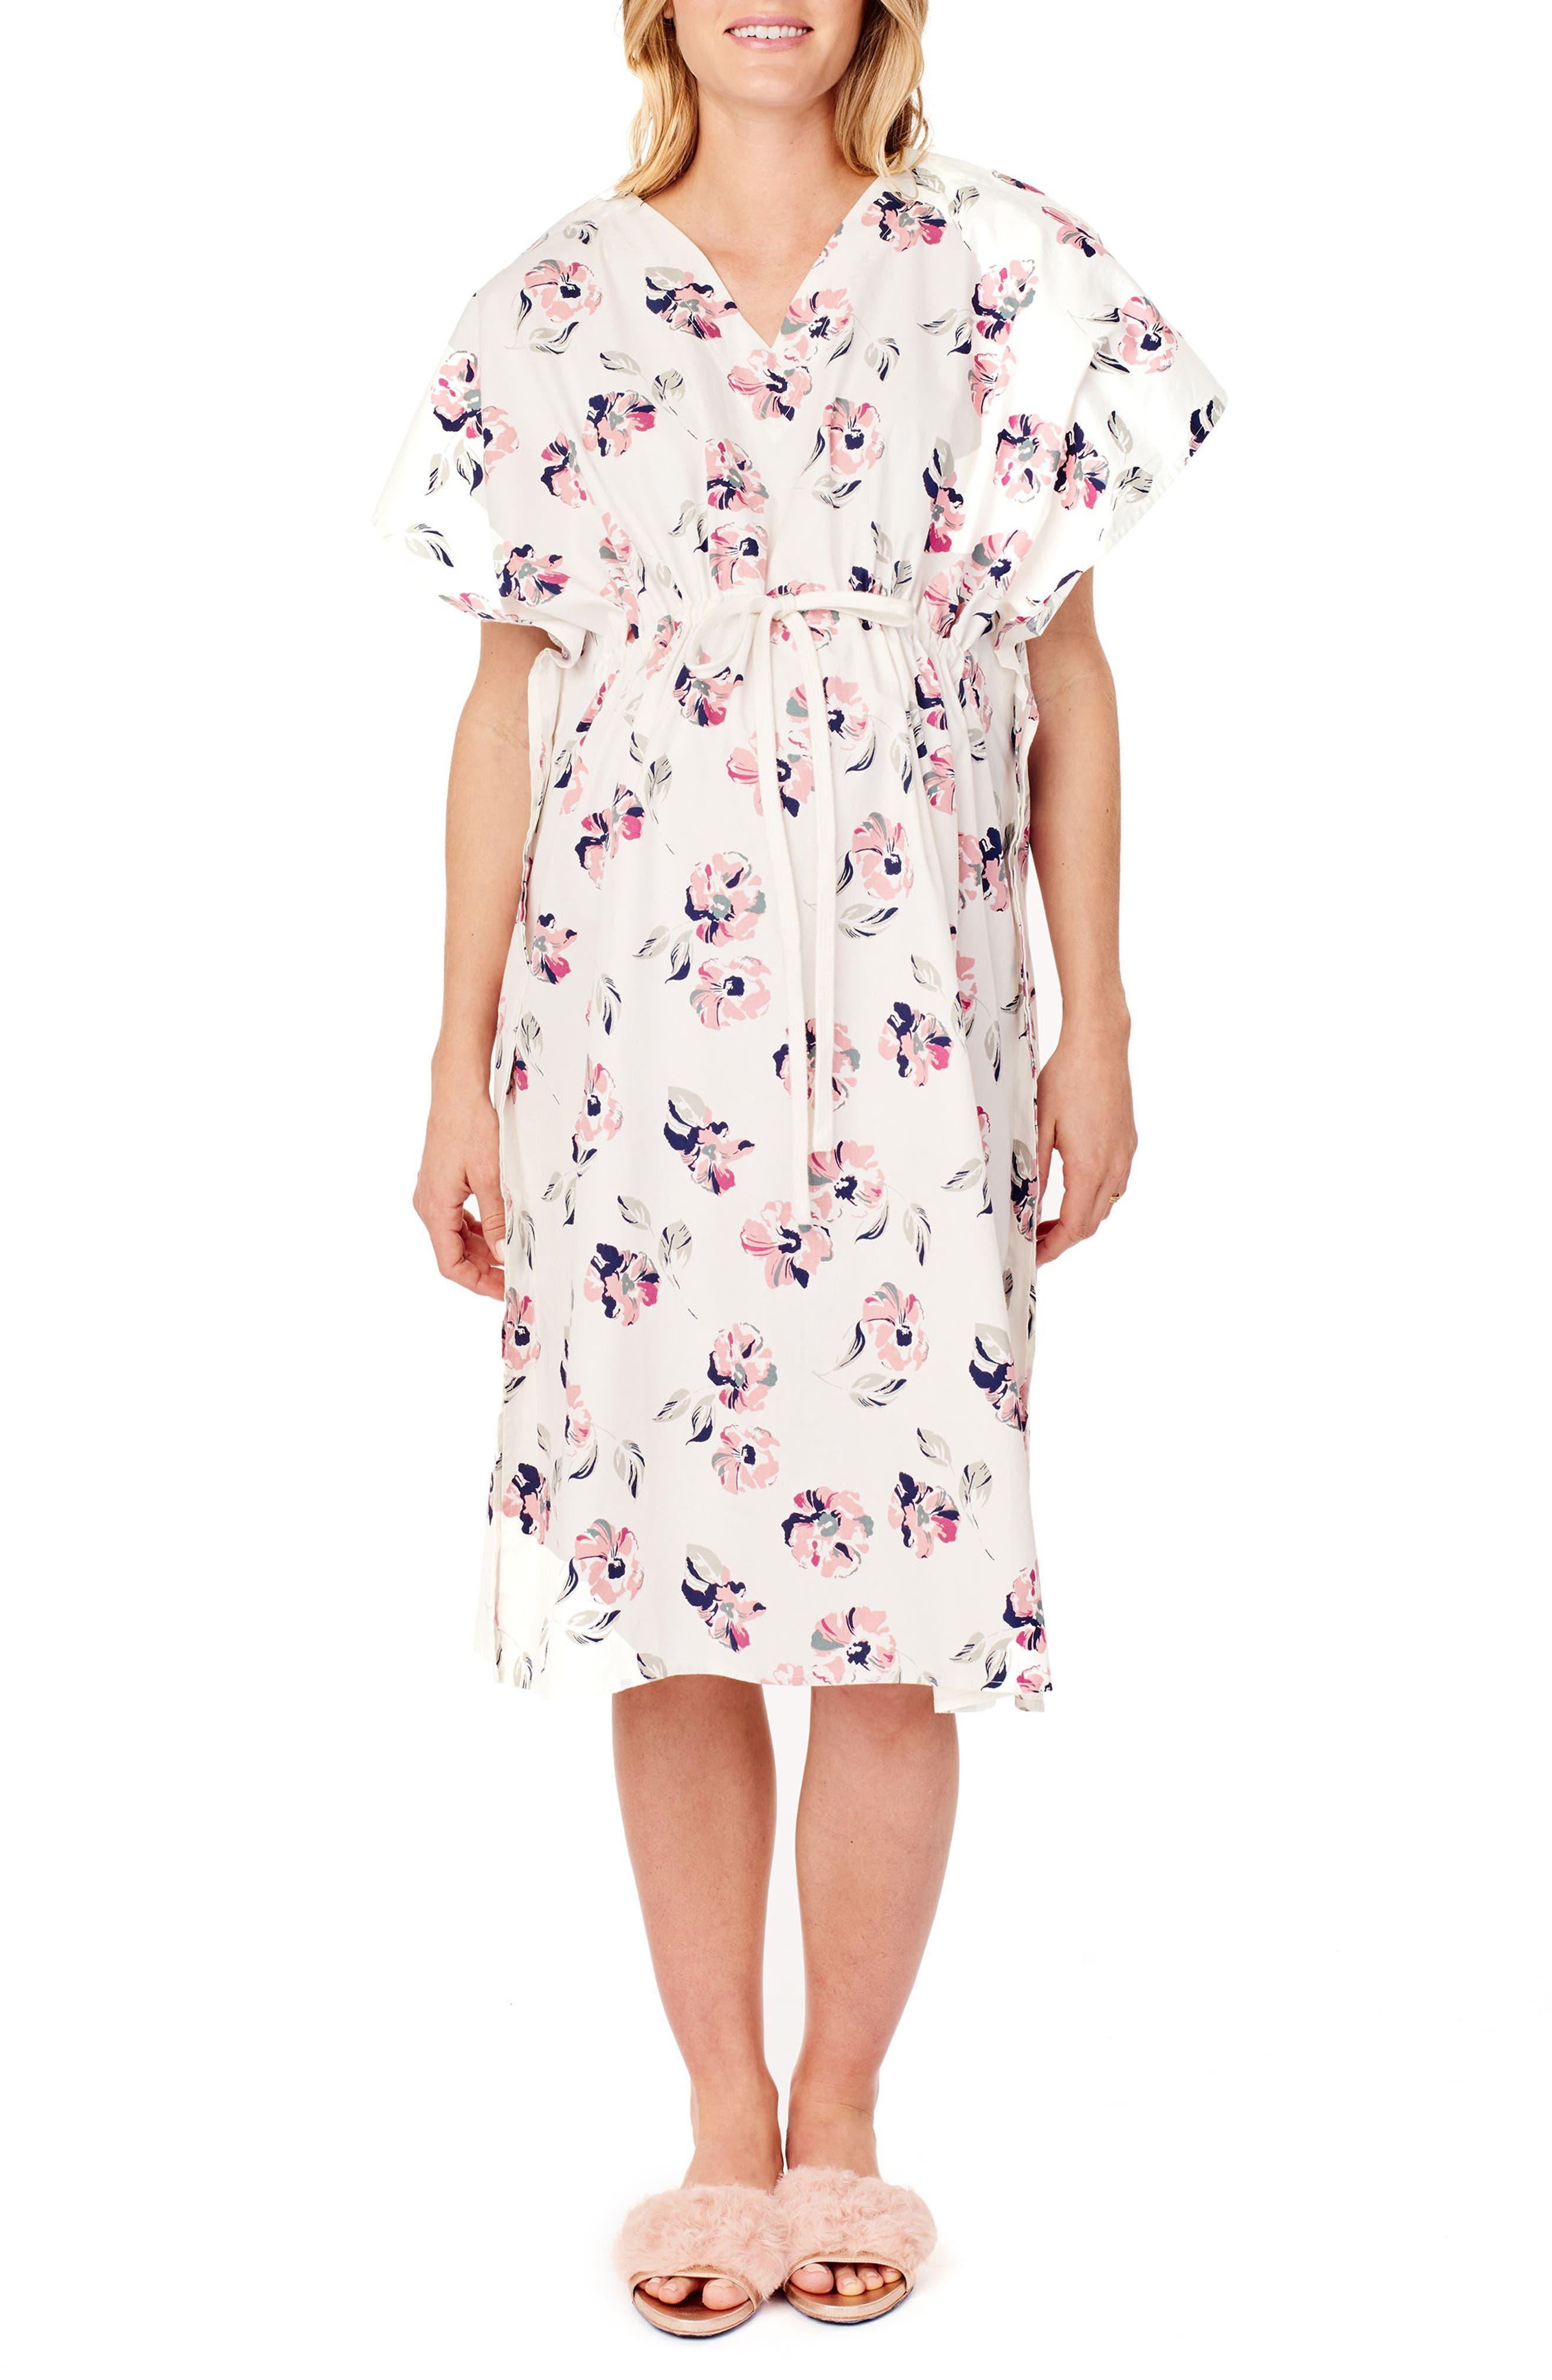 Ingrid & Isabel X James Fox & Co. Maternity/nursing Hospital Gown, Size One Size - Pink